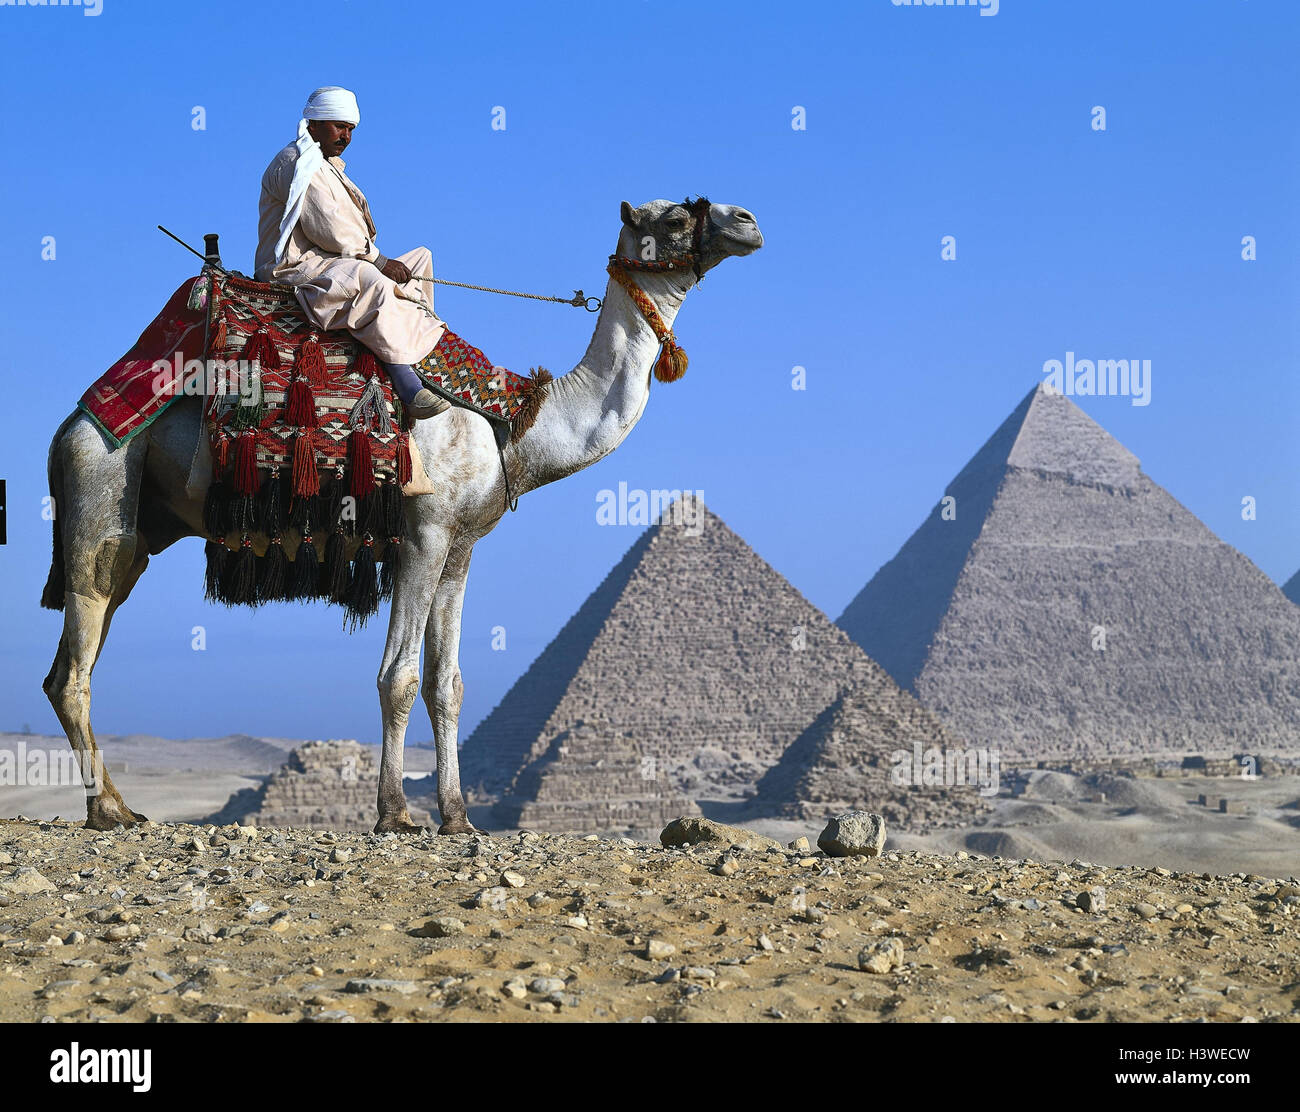 Egypt, Gizeh, pyramids, camel bleeds, outside, Africa, East, Giseh, Gise, Giza, Al-Giza, El-Giseh, pyramids, place - Stock Image